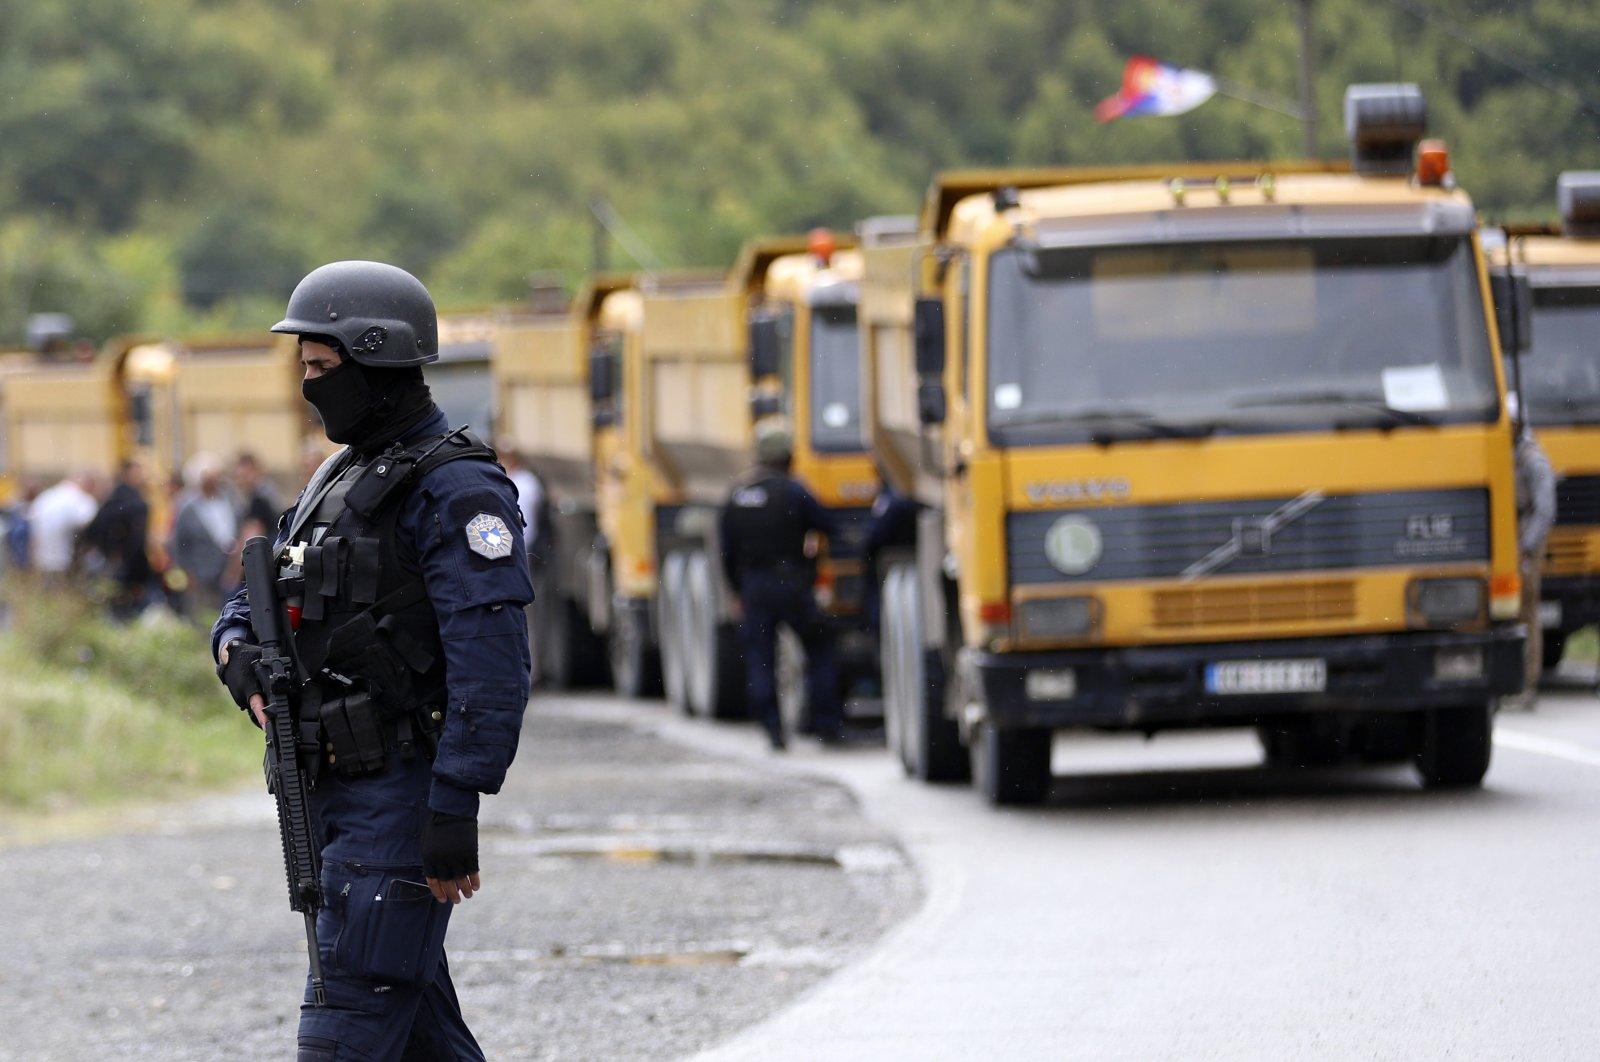 A Kosovo special police officer stands near trucks where Kosovo Serbs block a road near the northern Kosovo border crossing of Jarinje, Monday, Sept. 20, 2021. (AP Photo)